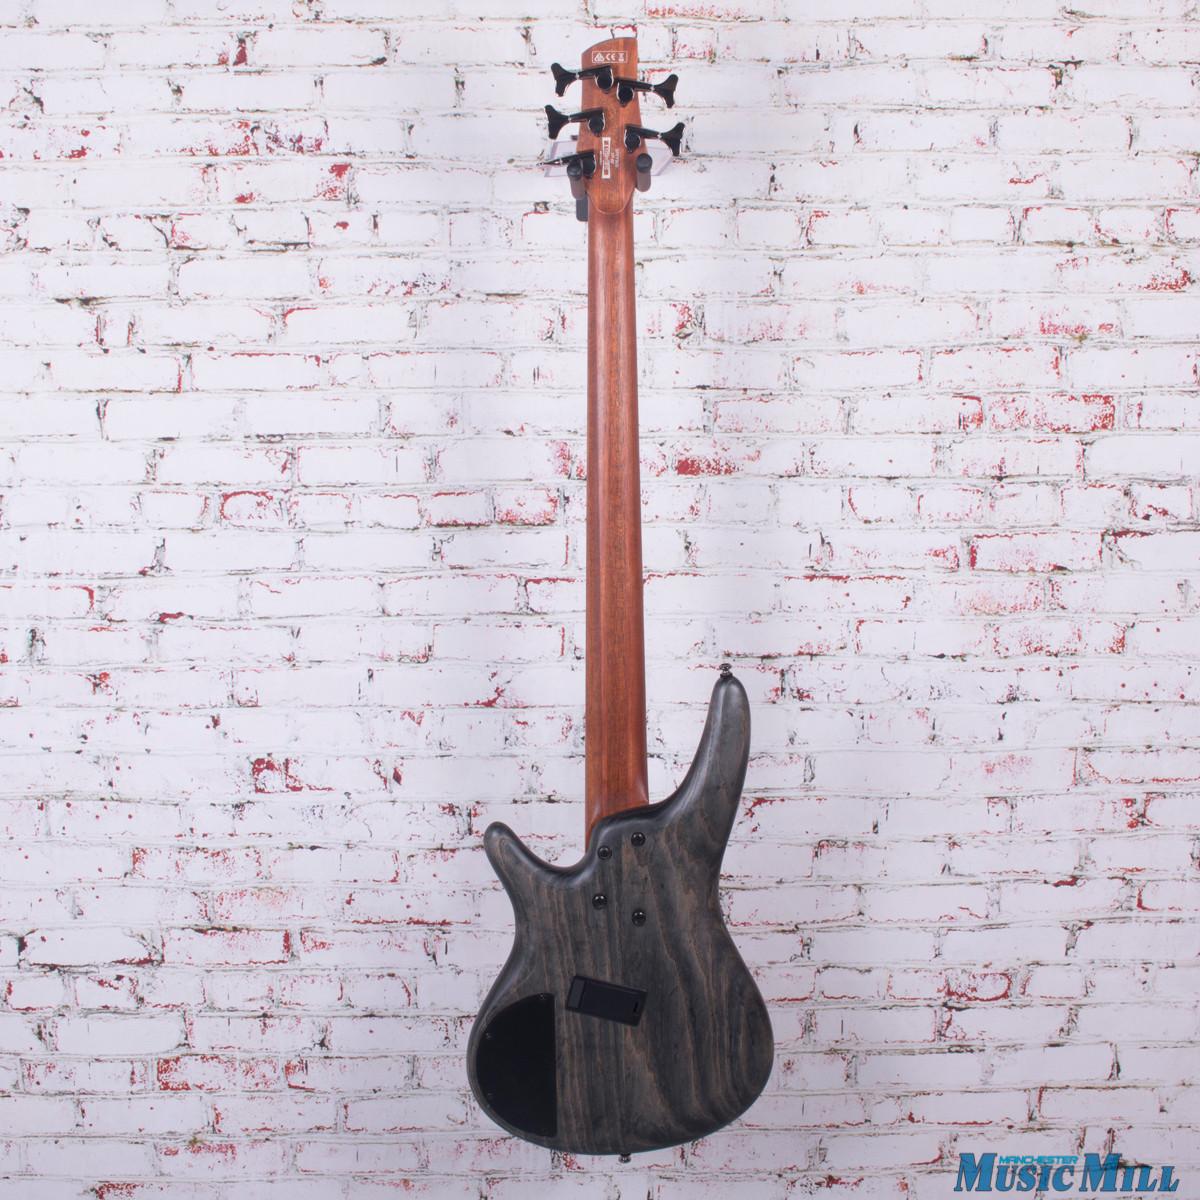 Ibanez SRFF805 Fanned Fret 5 String Bass Guitar